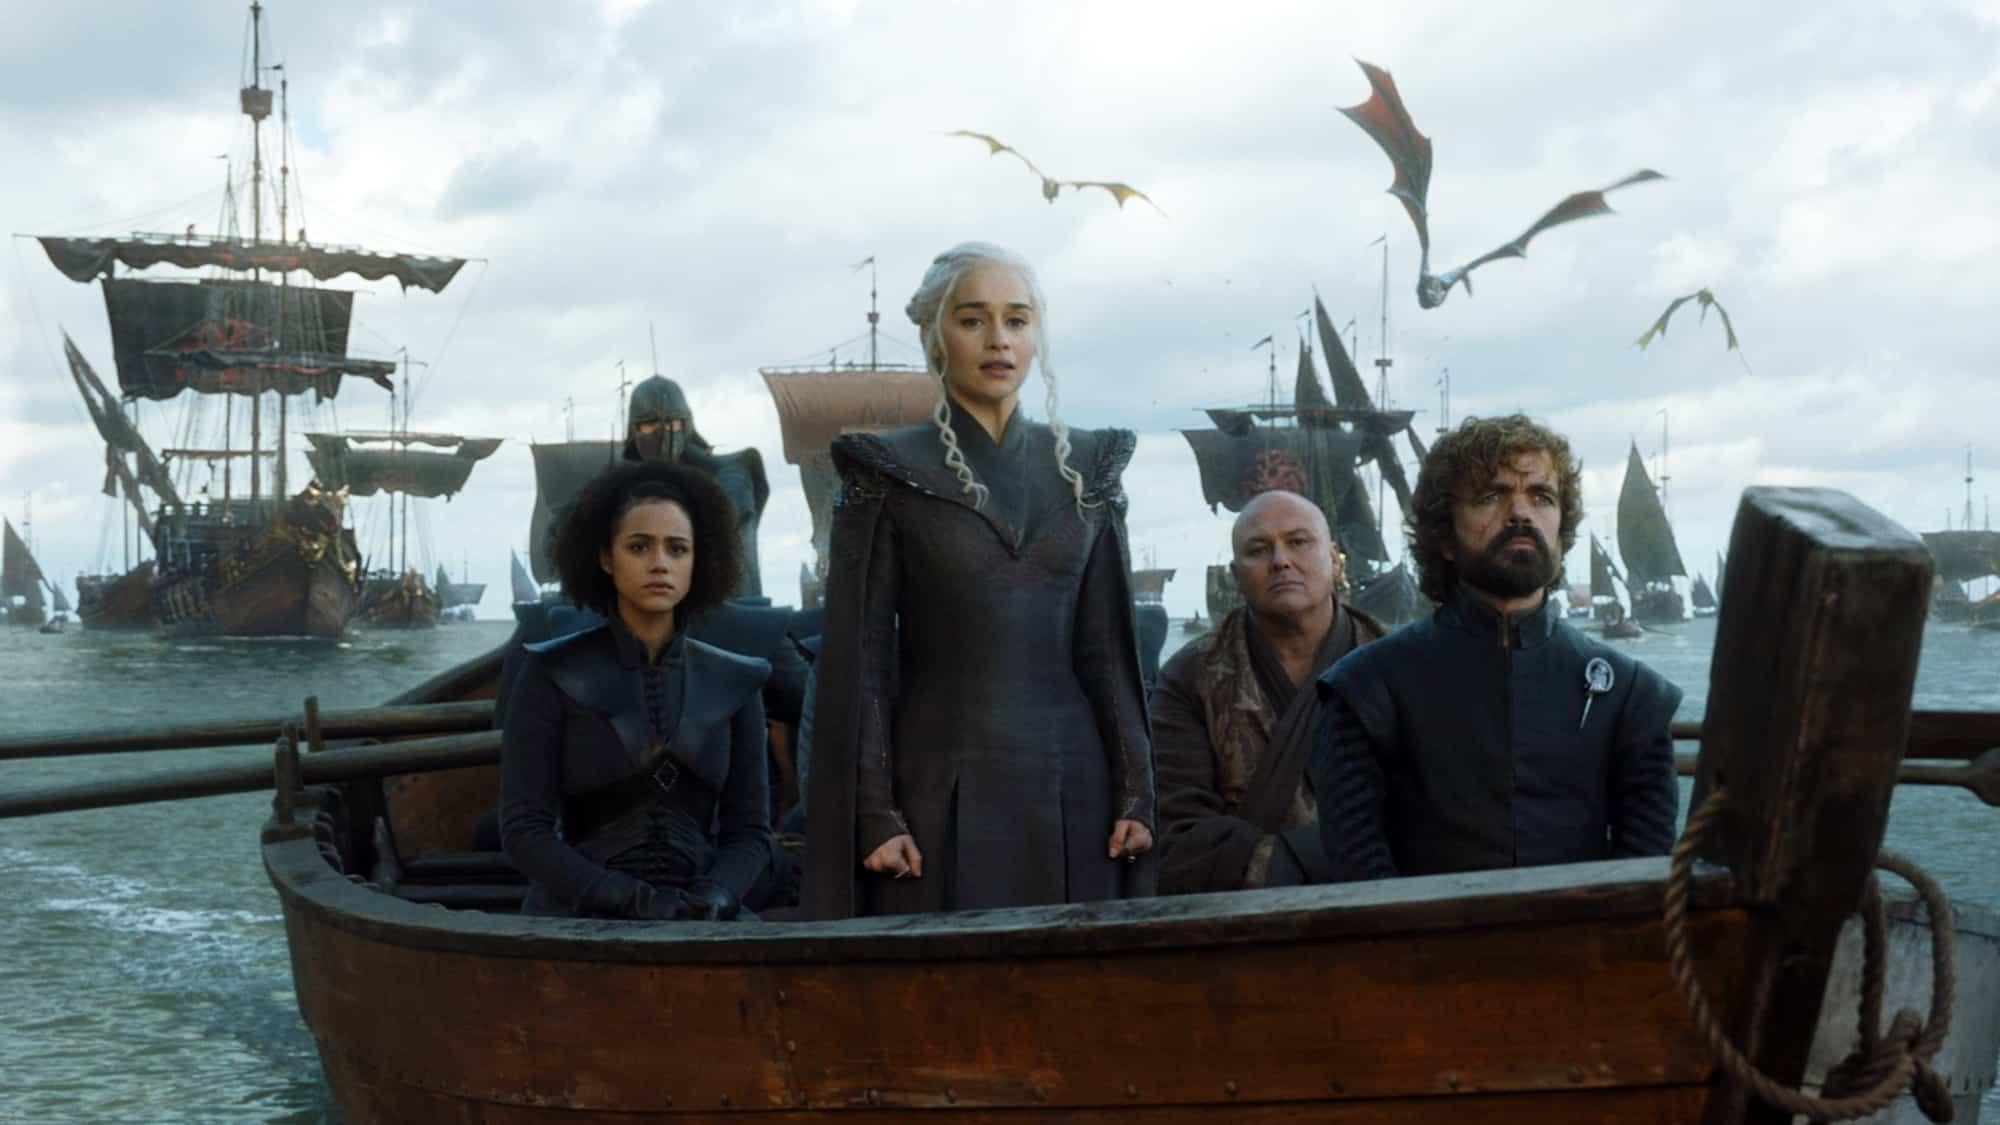 Game of Thrones: Season 7 Episode 1 – Dragonstone